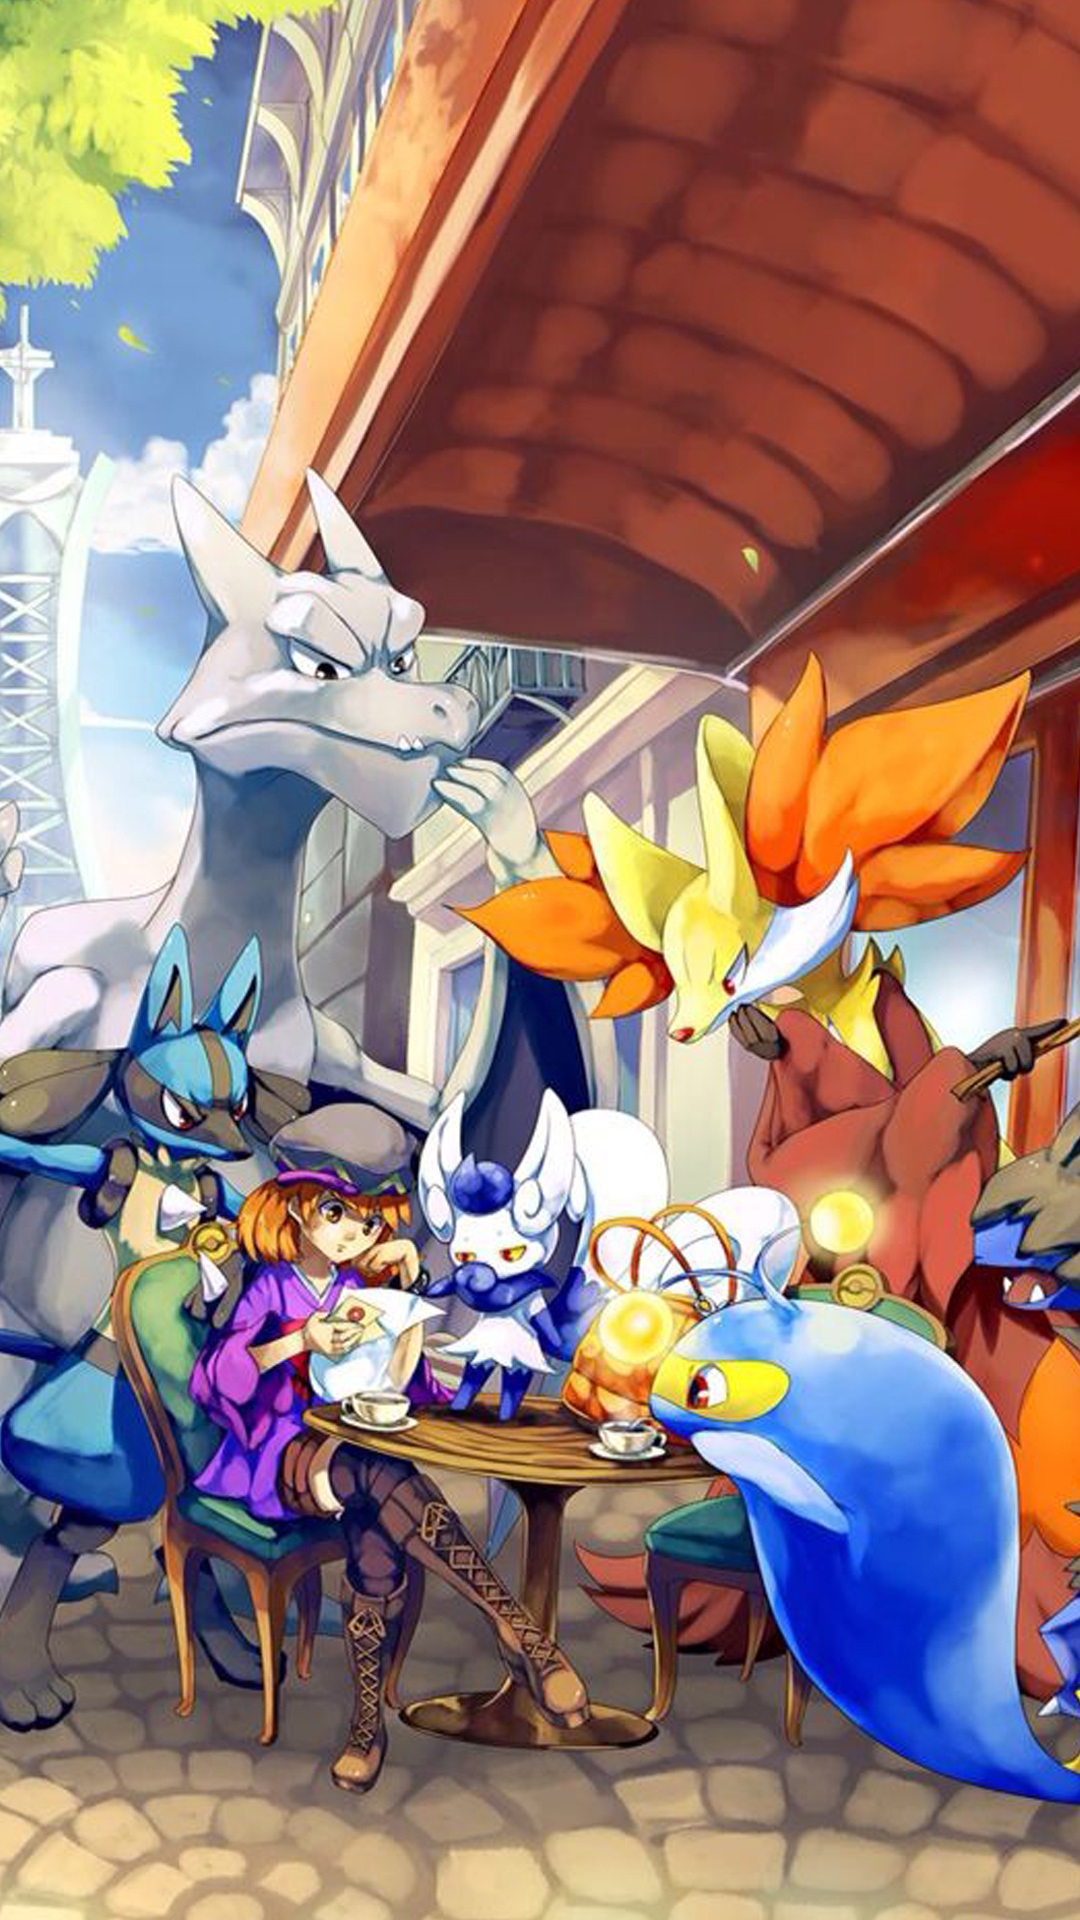 Hình nền Pokémon GO!